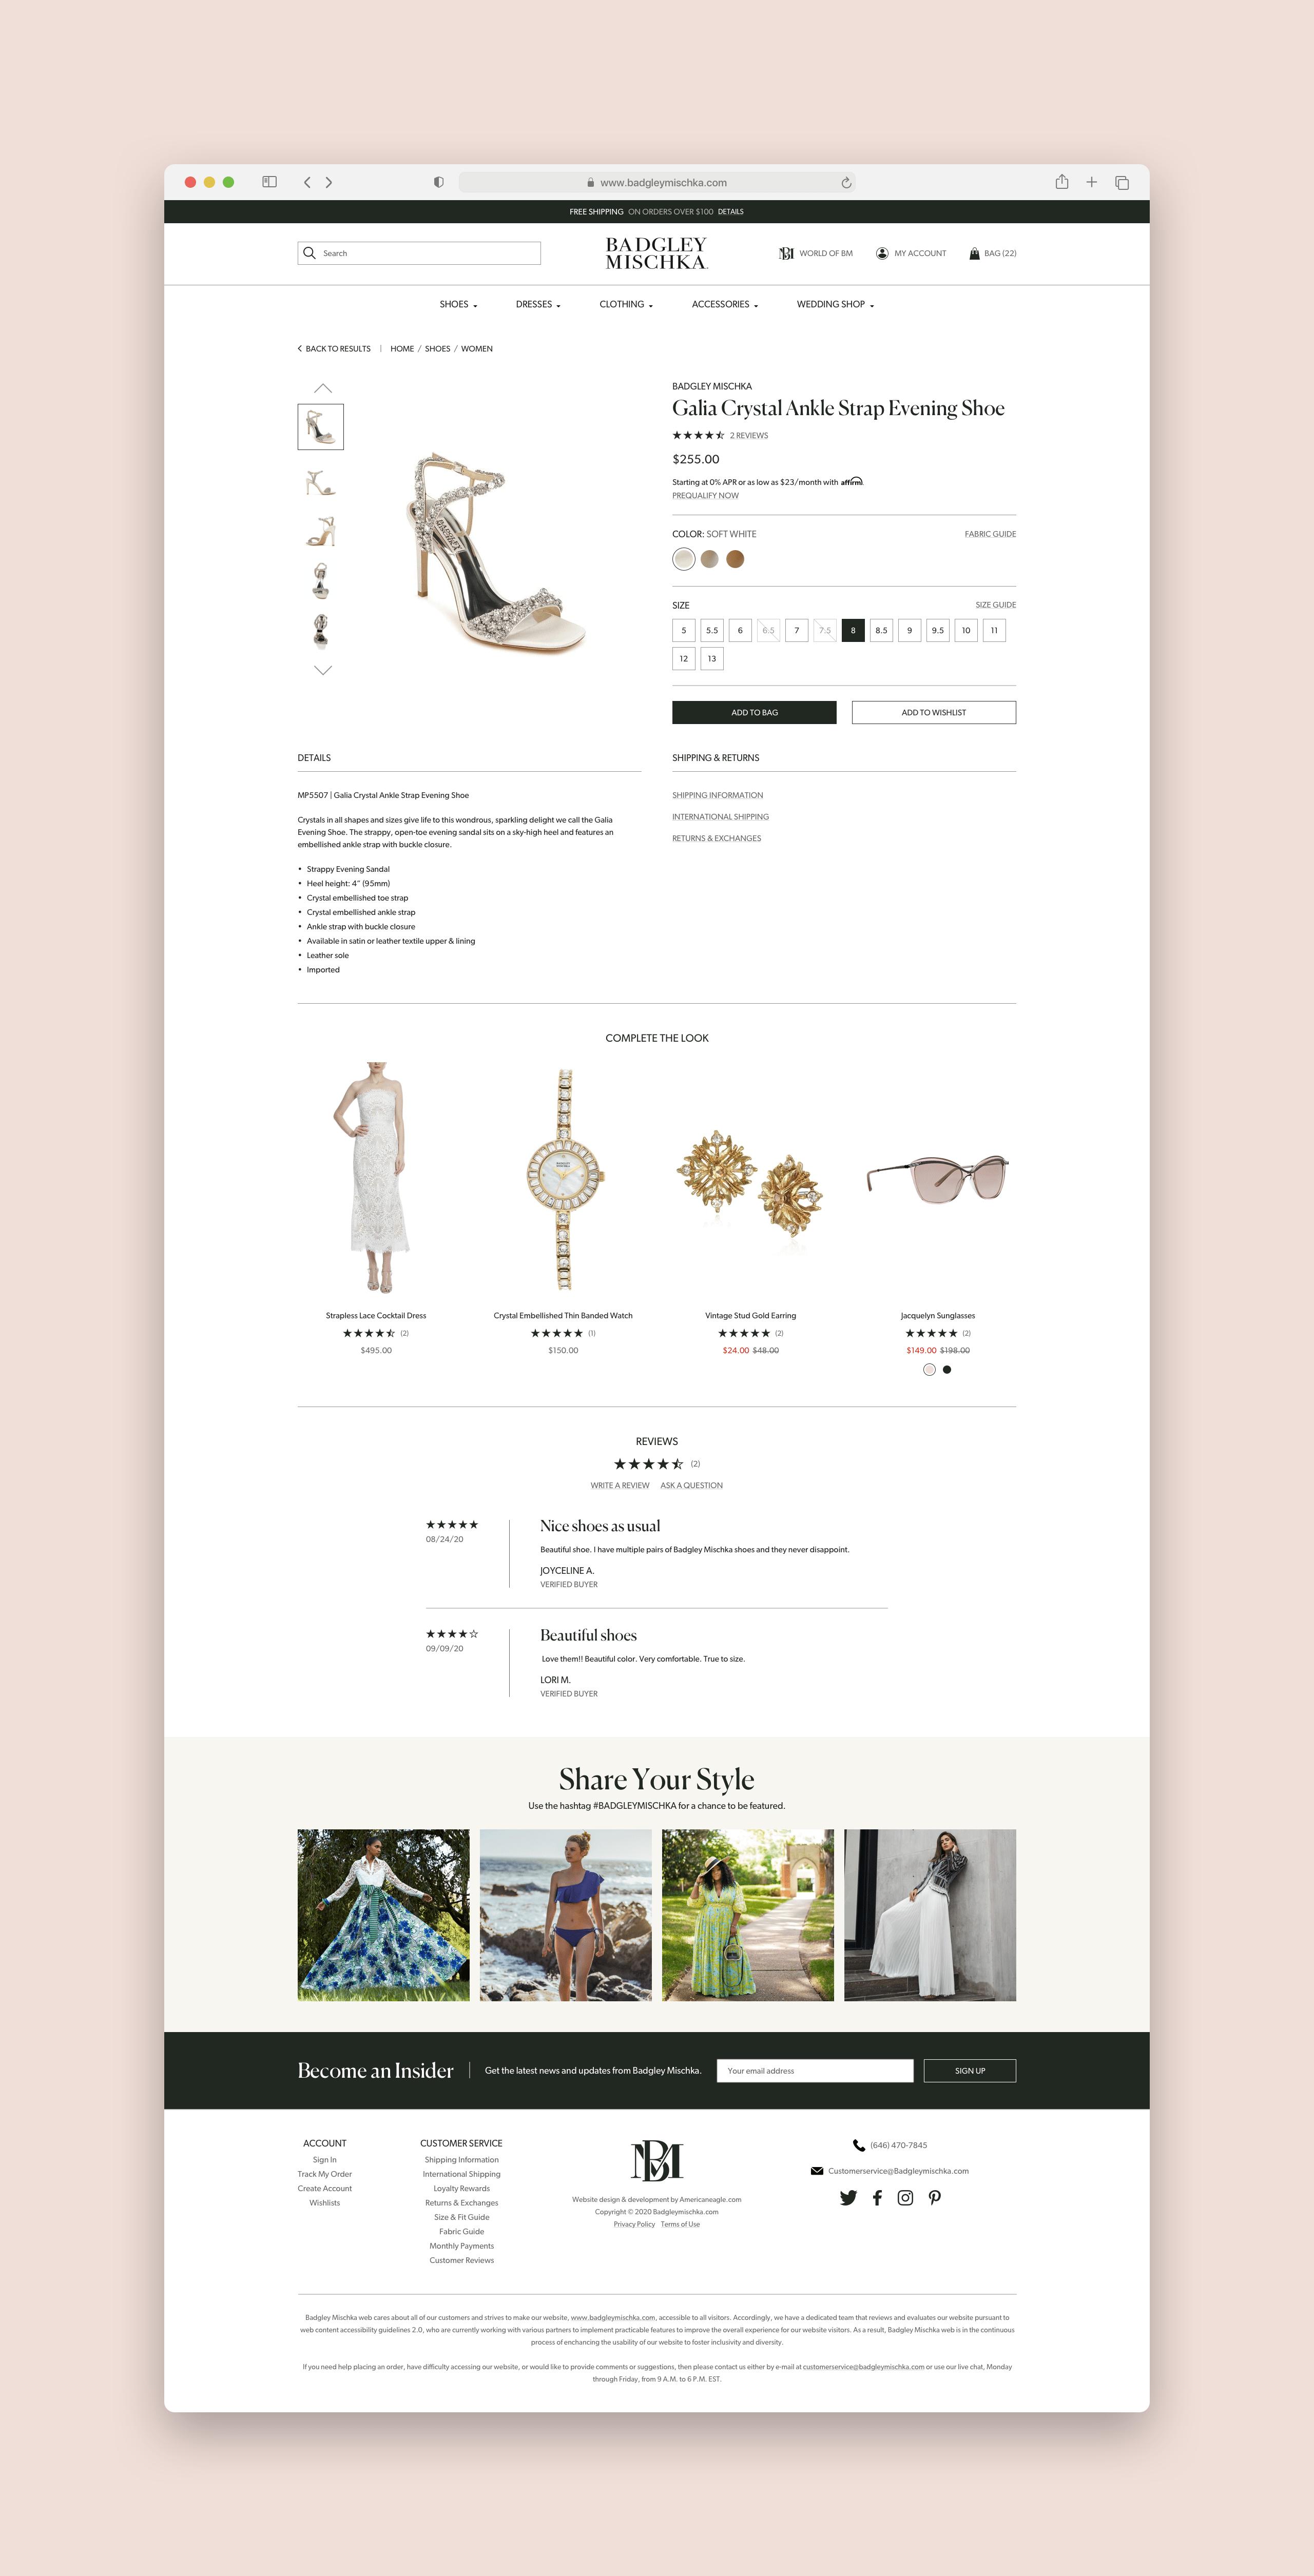 Badgley Mischka Product Detail